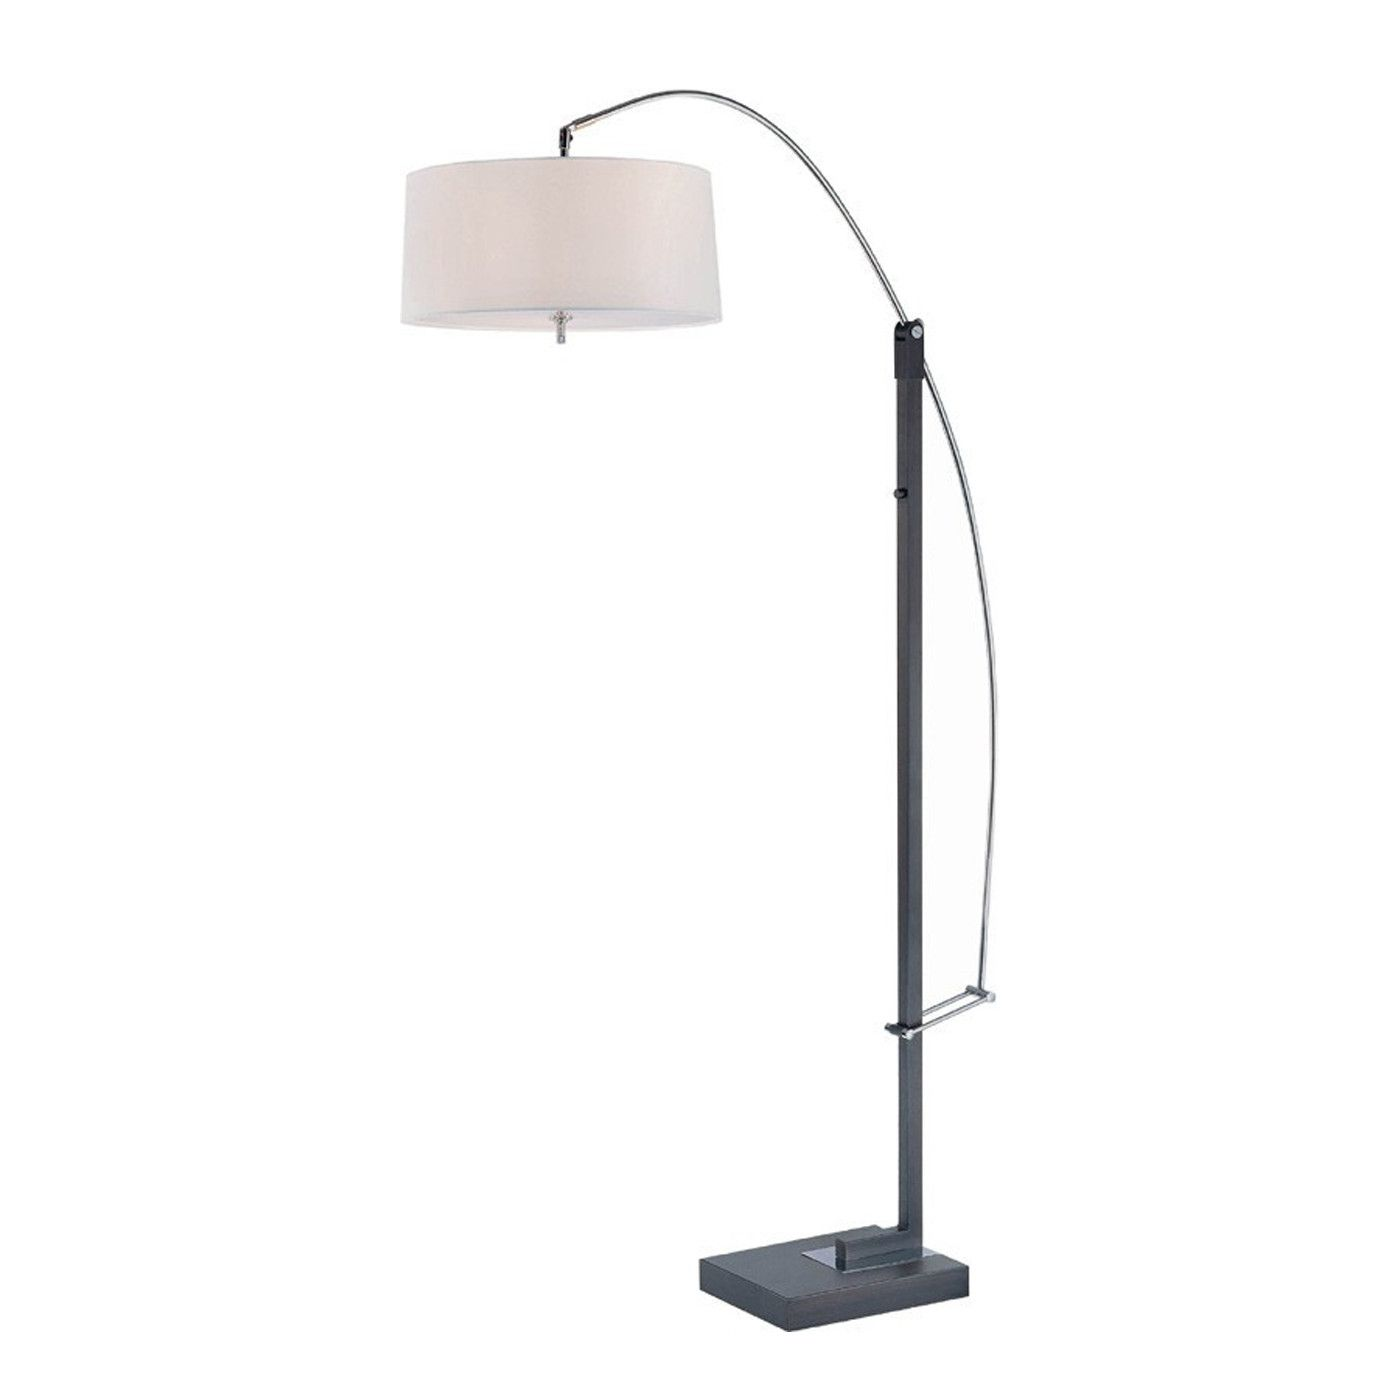 international nickel floor design dimmer arm fresh arch arc lamp with furniture ideas of ore